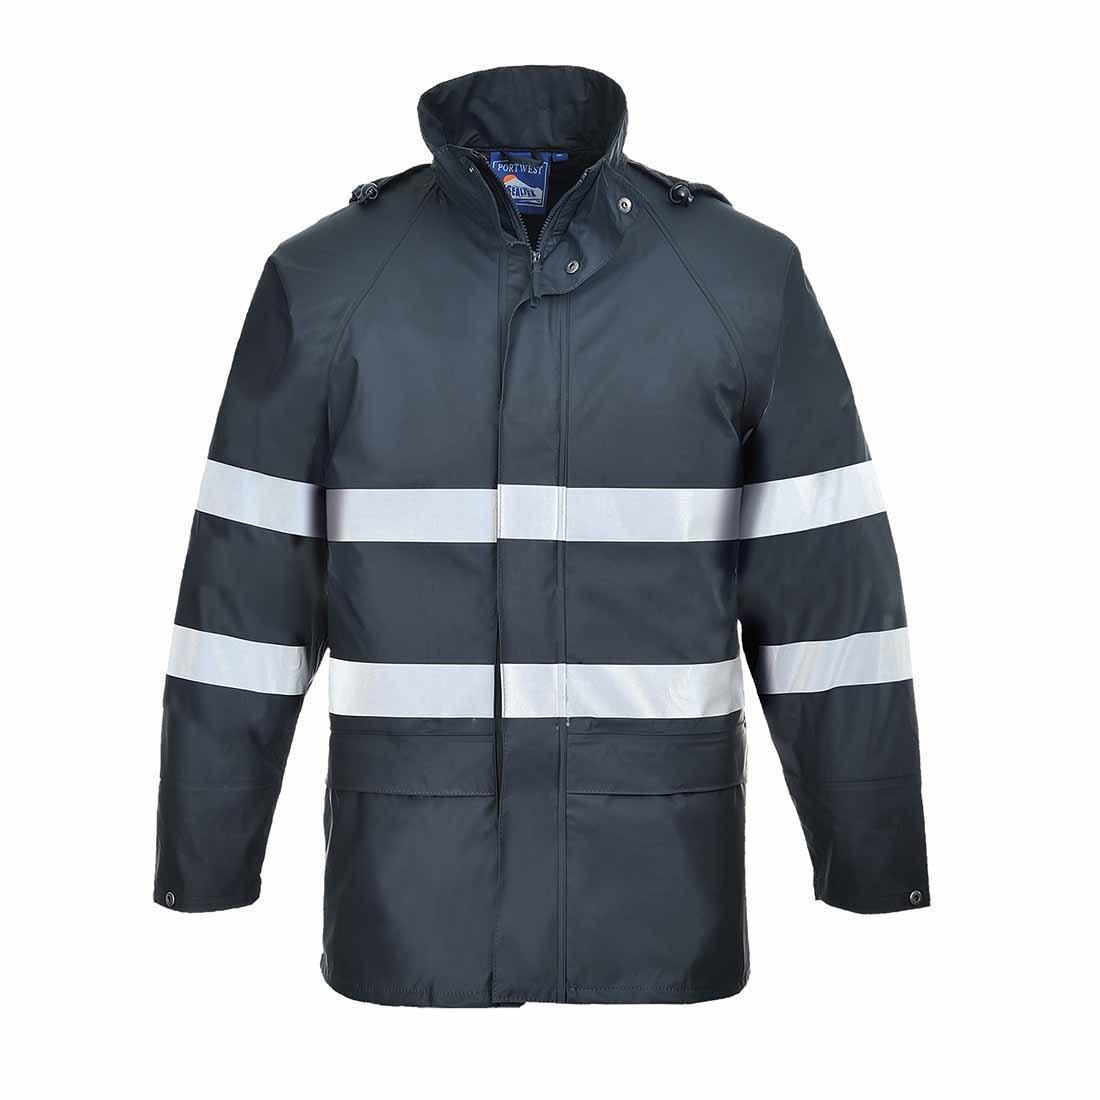 Portwest Workwear Mens Iona Sealtex Jacket